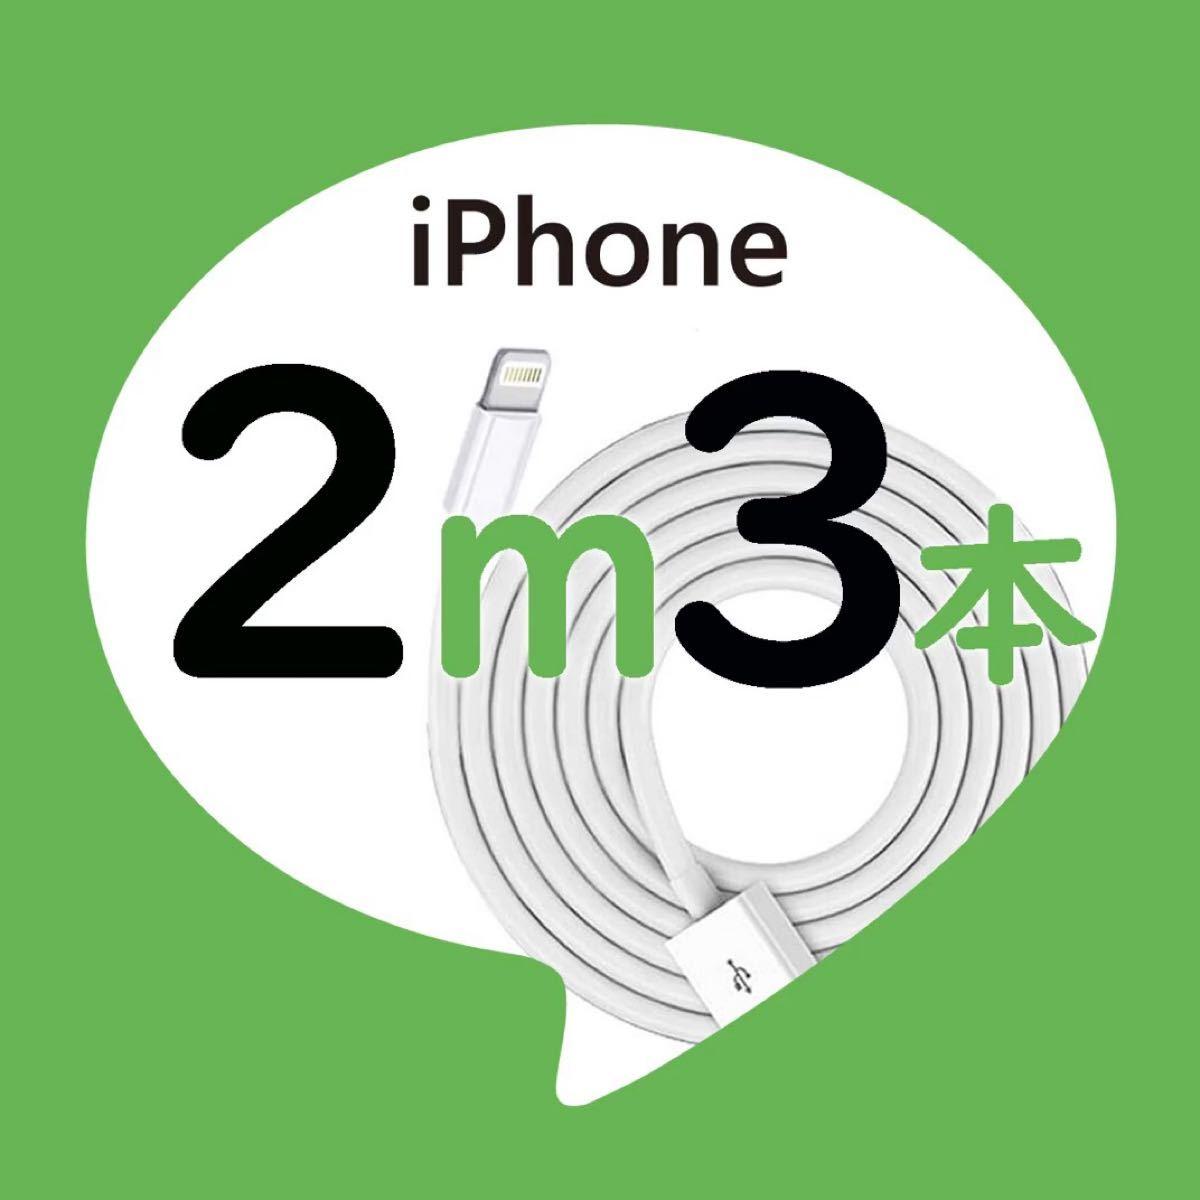 iPhone 充電器 充電ケーブル コード lightning cable 2m